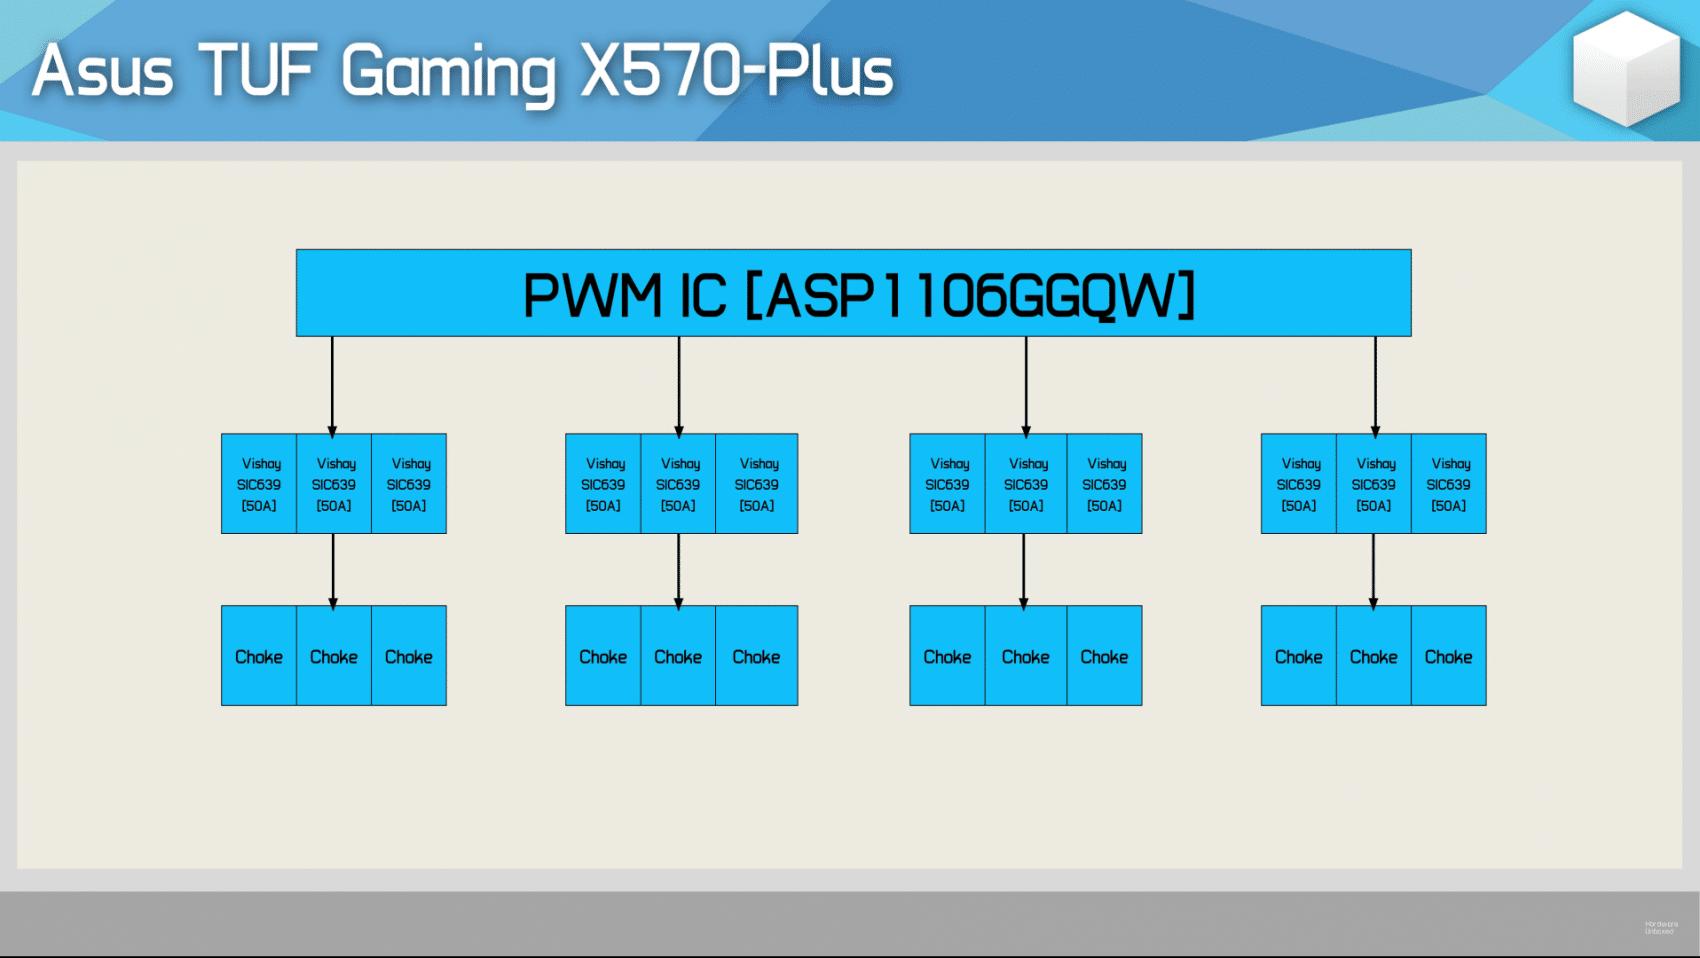 VRM ASUS TUF Gaming X570-Plus